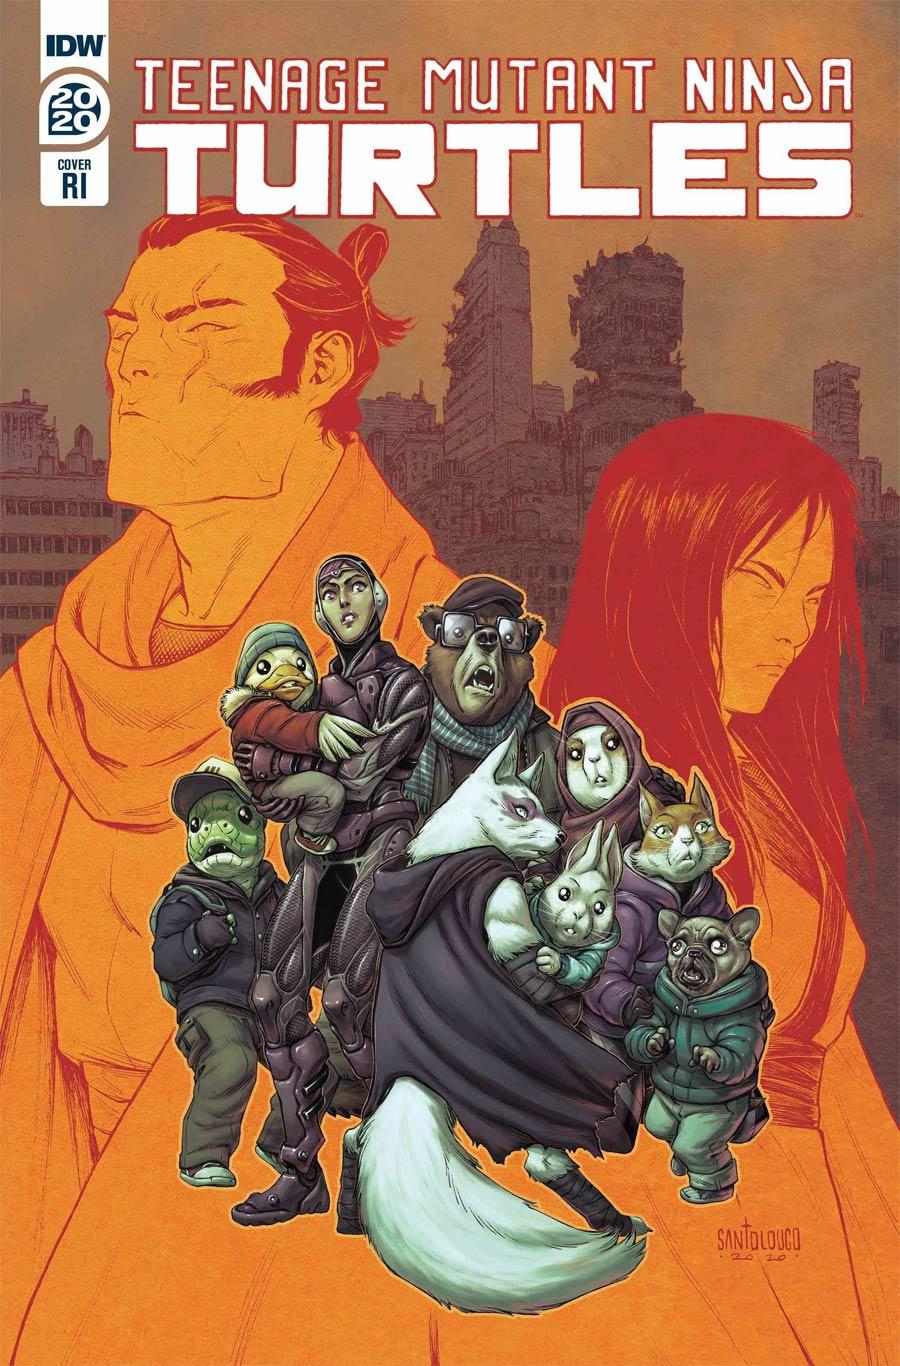 Teenage Mutant Ninja Turtles Vol 5 Annual 2020 Cover C Incentive Mateus Santolouco Variant Cover